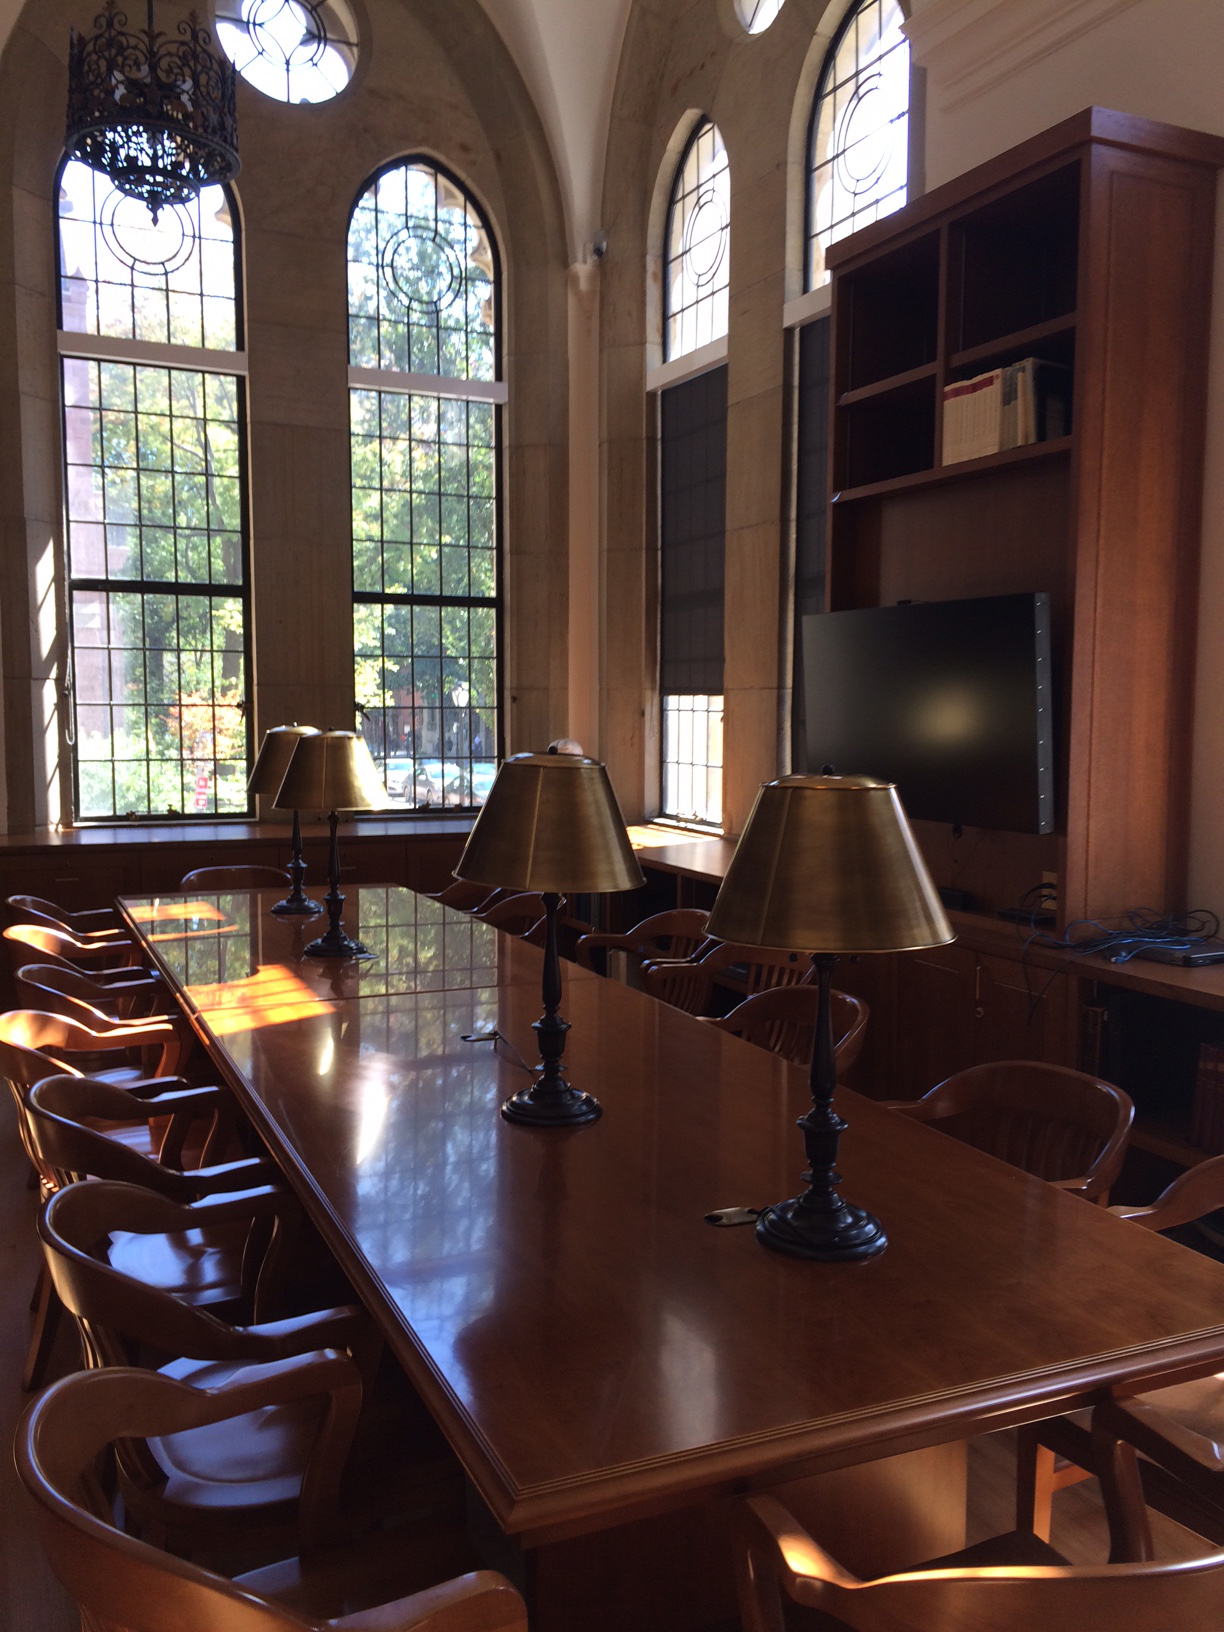 Yale center for language study